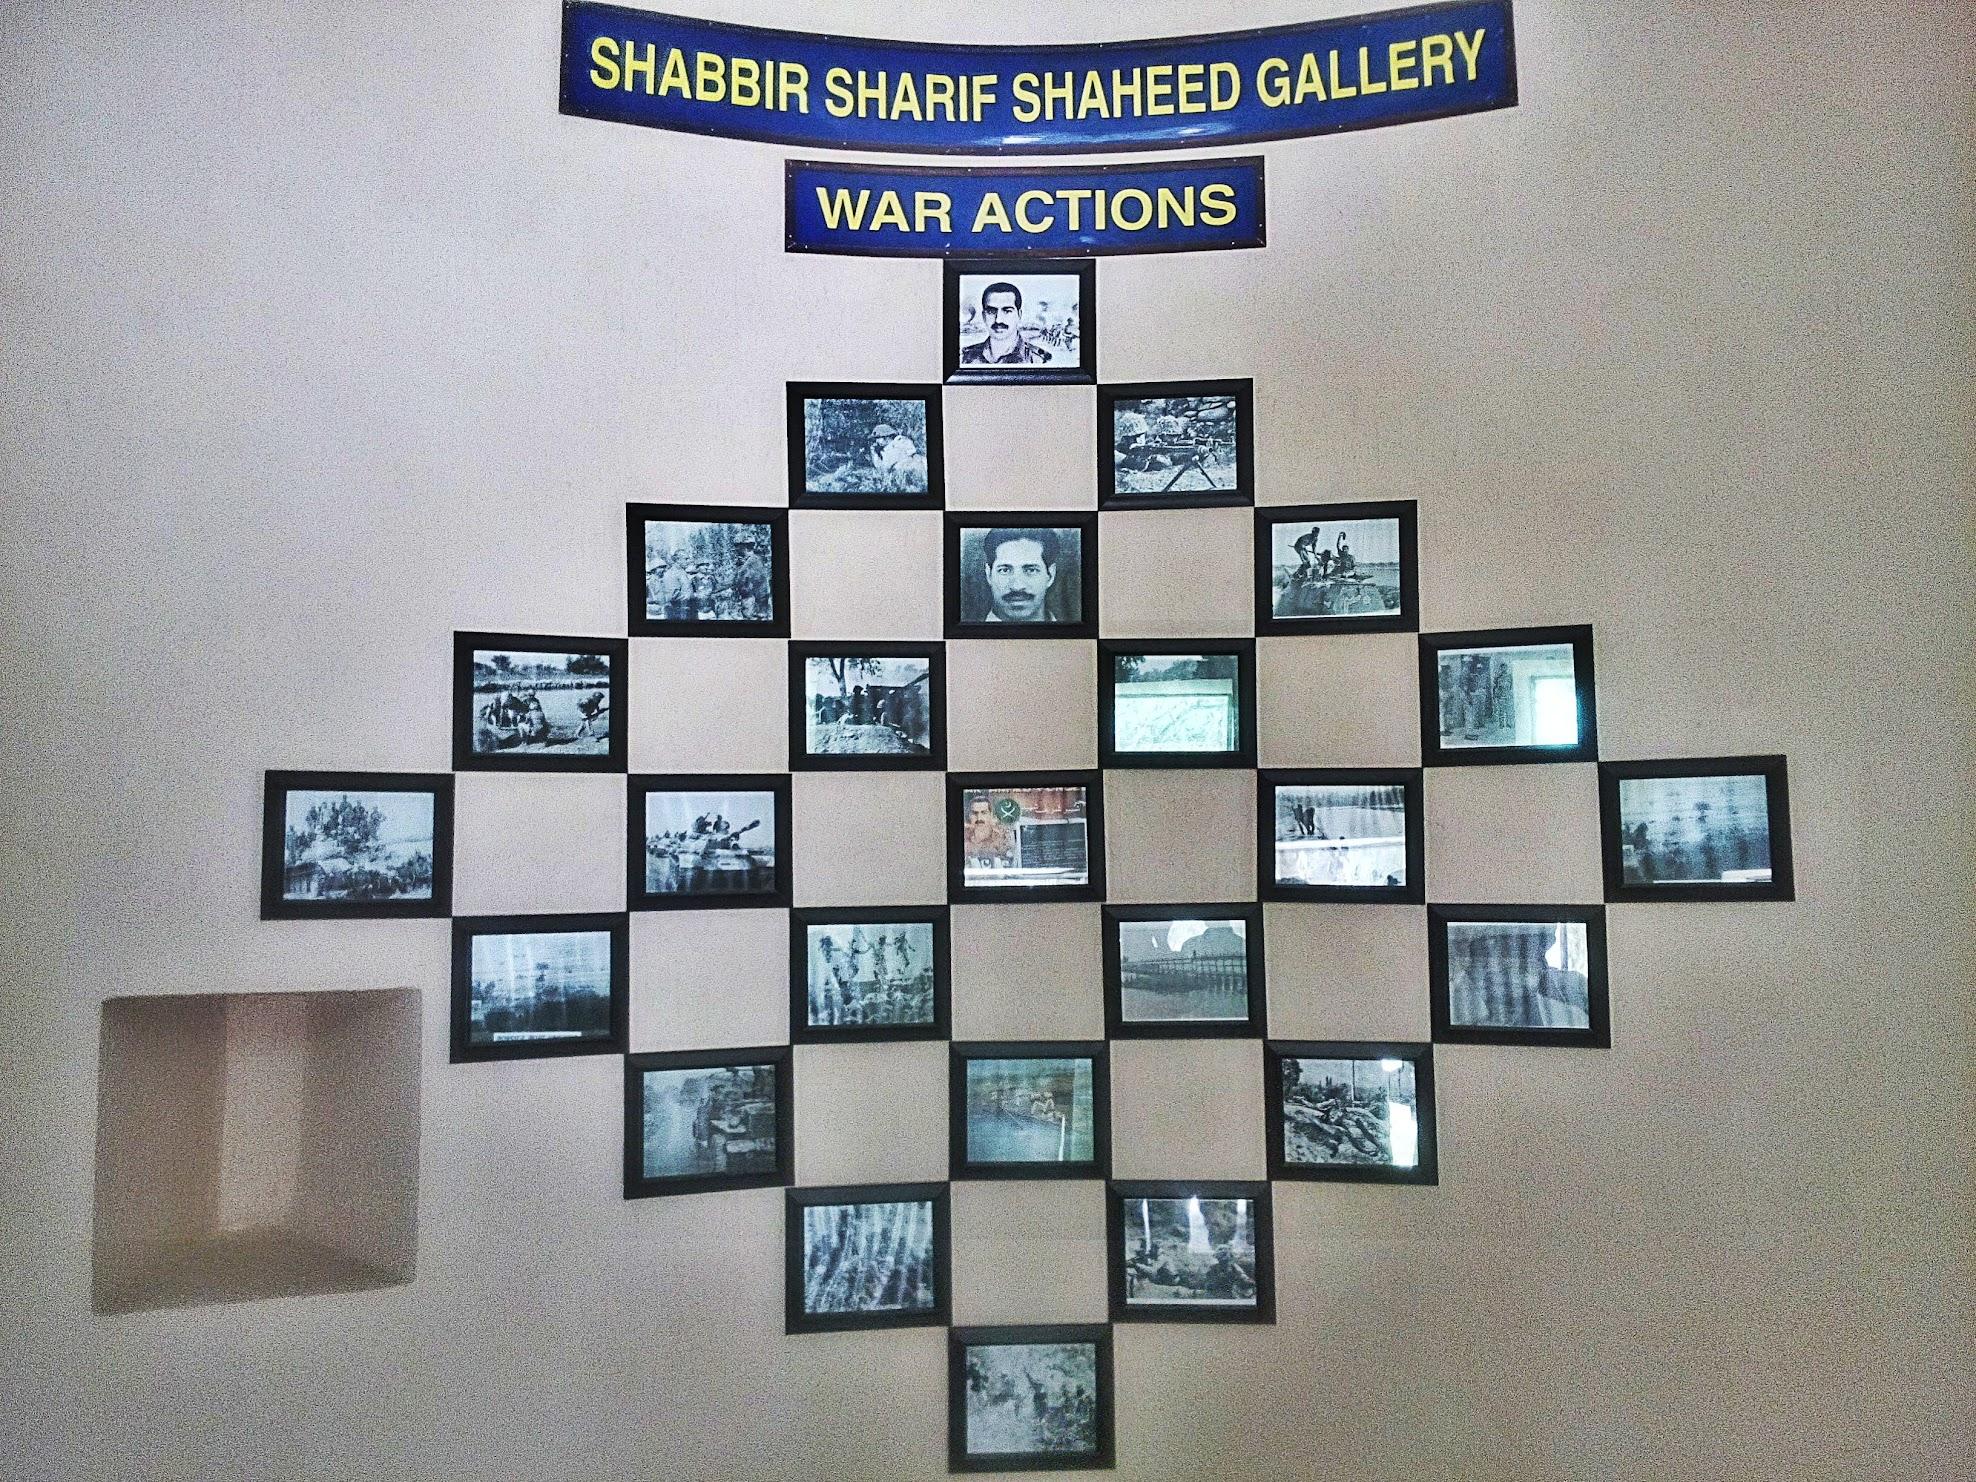 Shabbir Sharif Gallery inside Sulemanki Tower